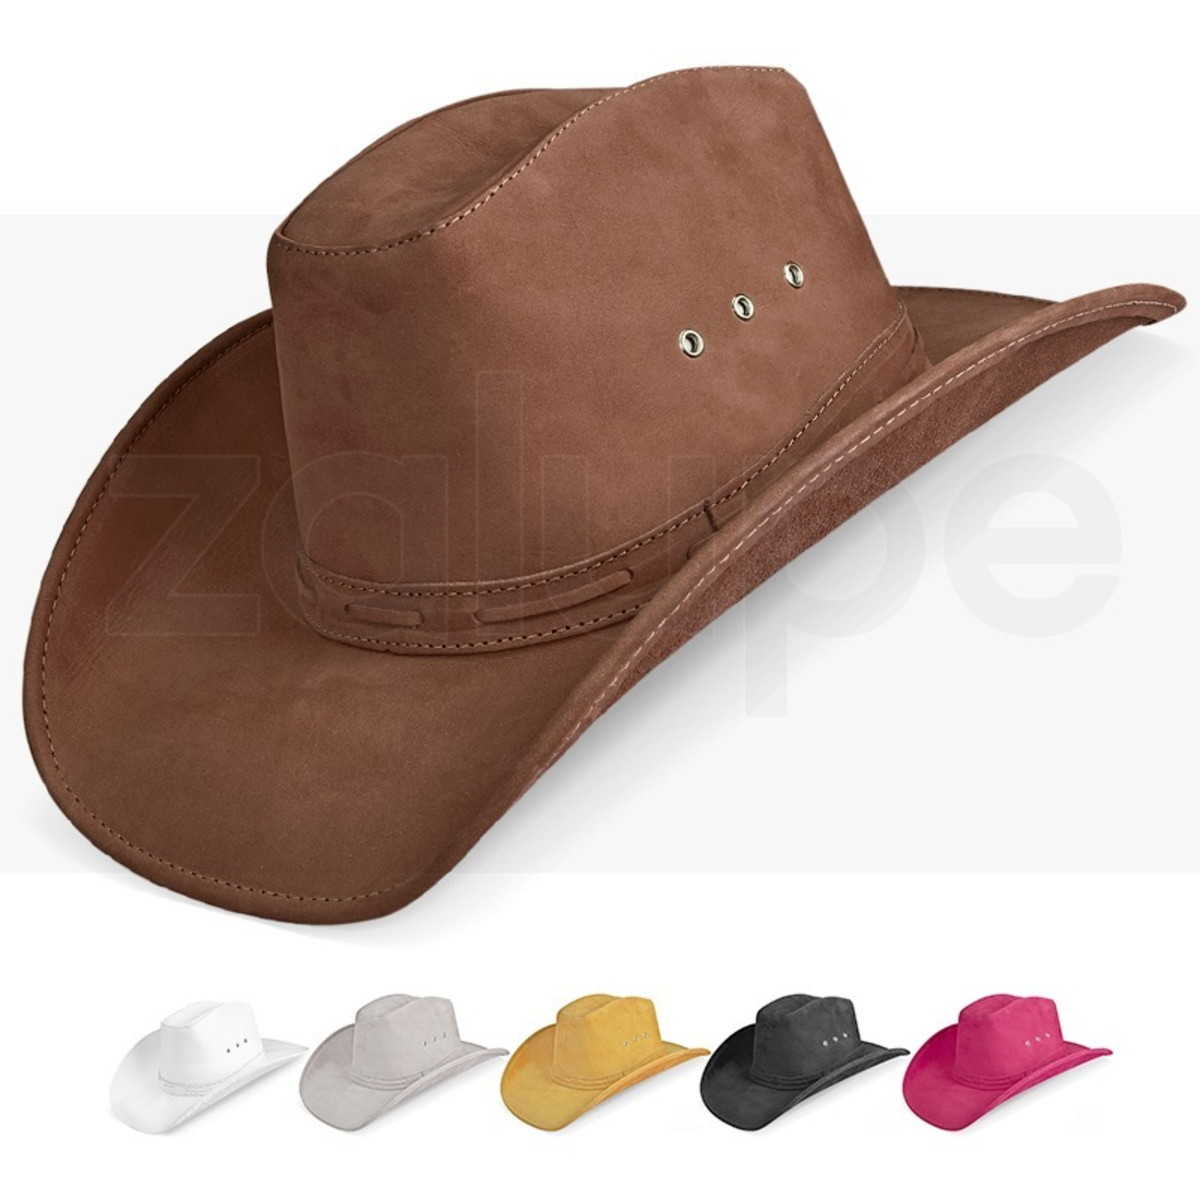 Chapeu Couro Masculino Country Texano Americano Rodeio Luxo no Elo7 ... aee82ee7762